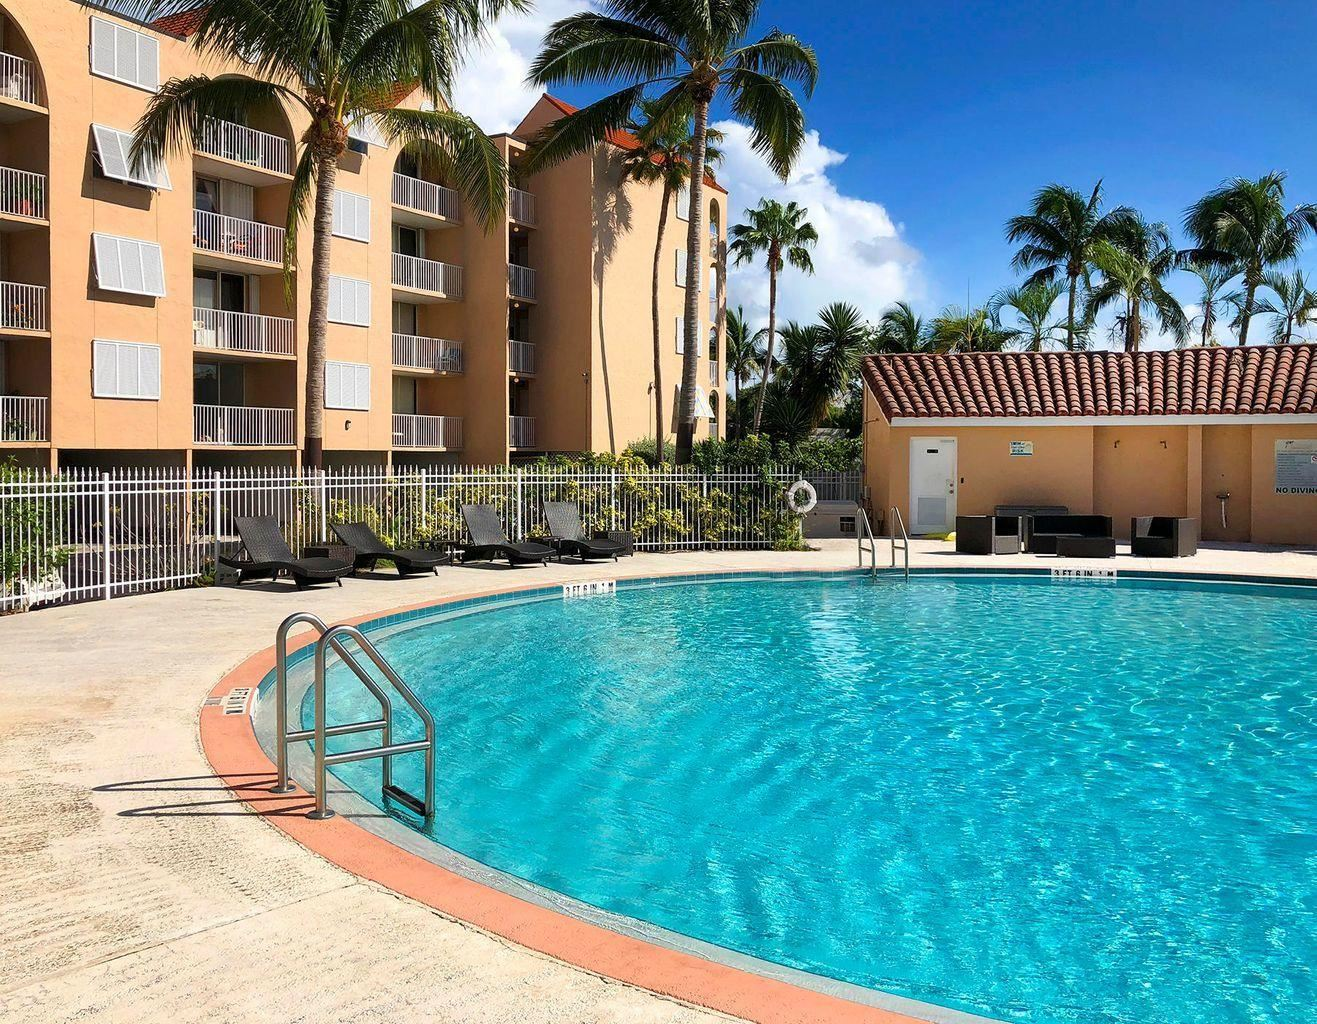 3930 S 3930 Roosevelt Boulevard #N304, Key West, FL 33040 - #: 595555